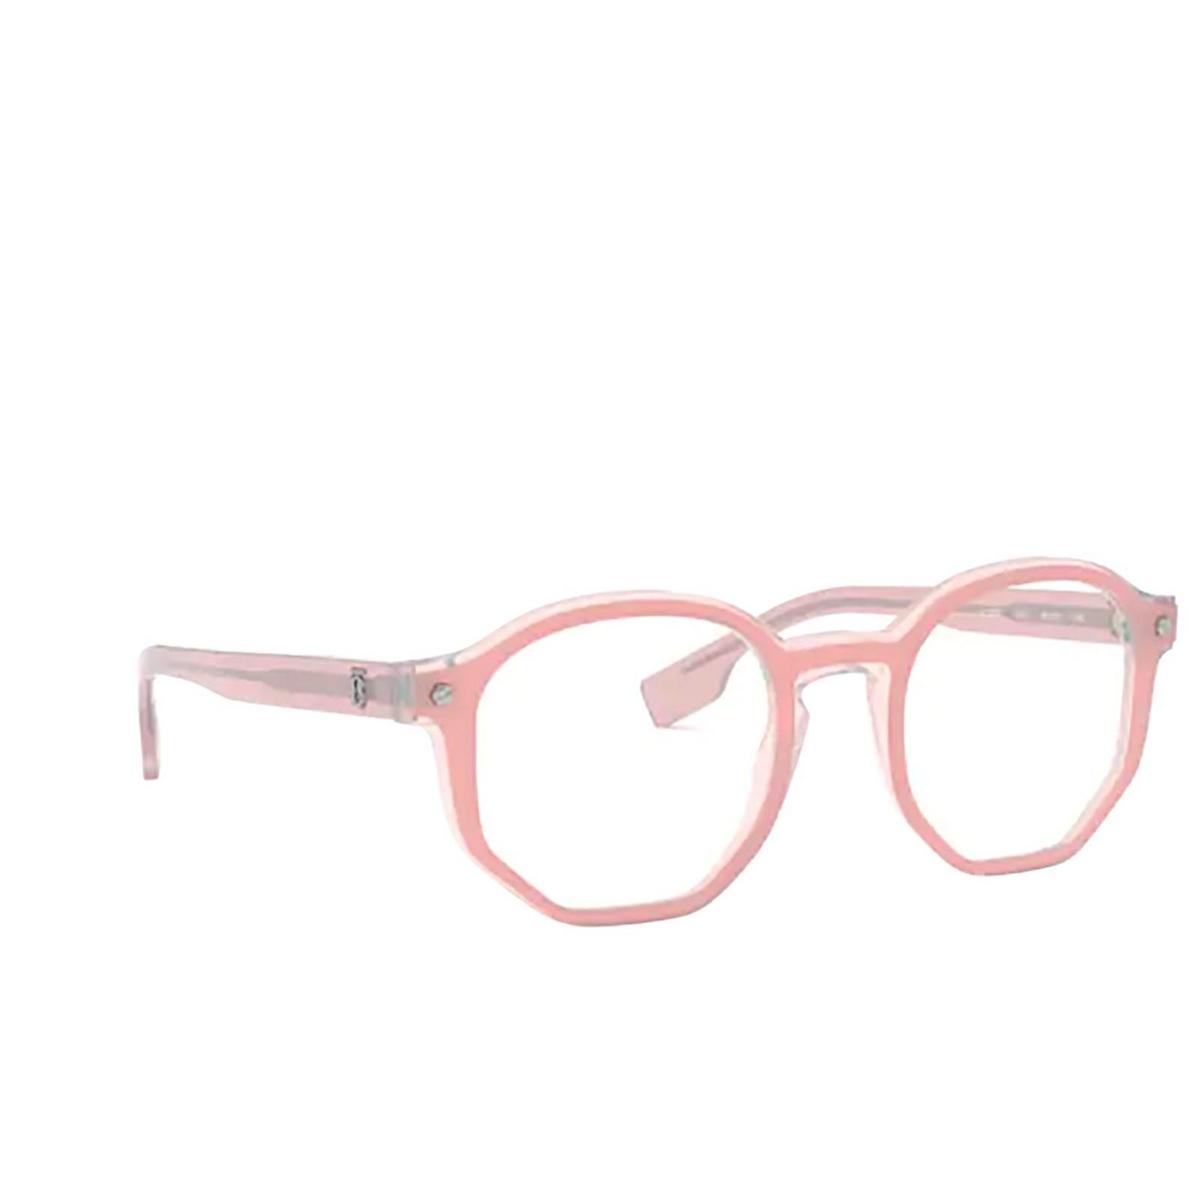 Burberry® Irregular Eyeglasses: Hogarth BE2317 color Top Opal Pink On Pink Transparent 3847 - three-quarters view.